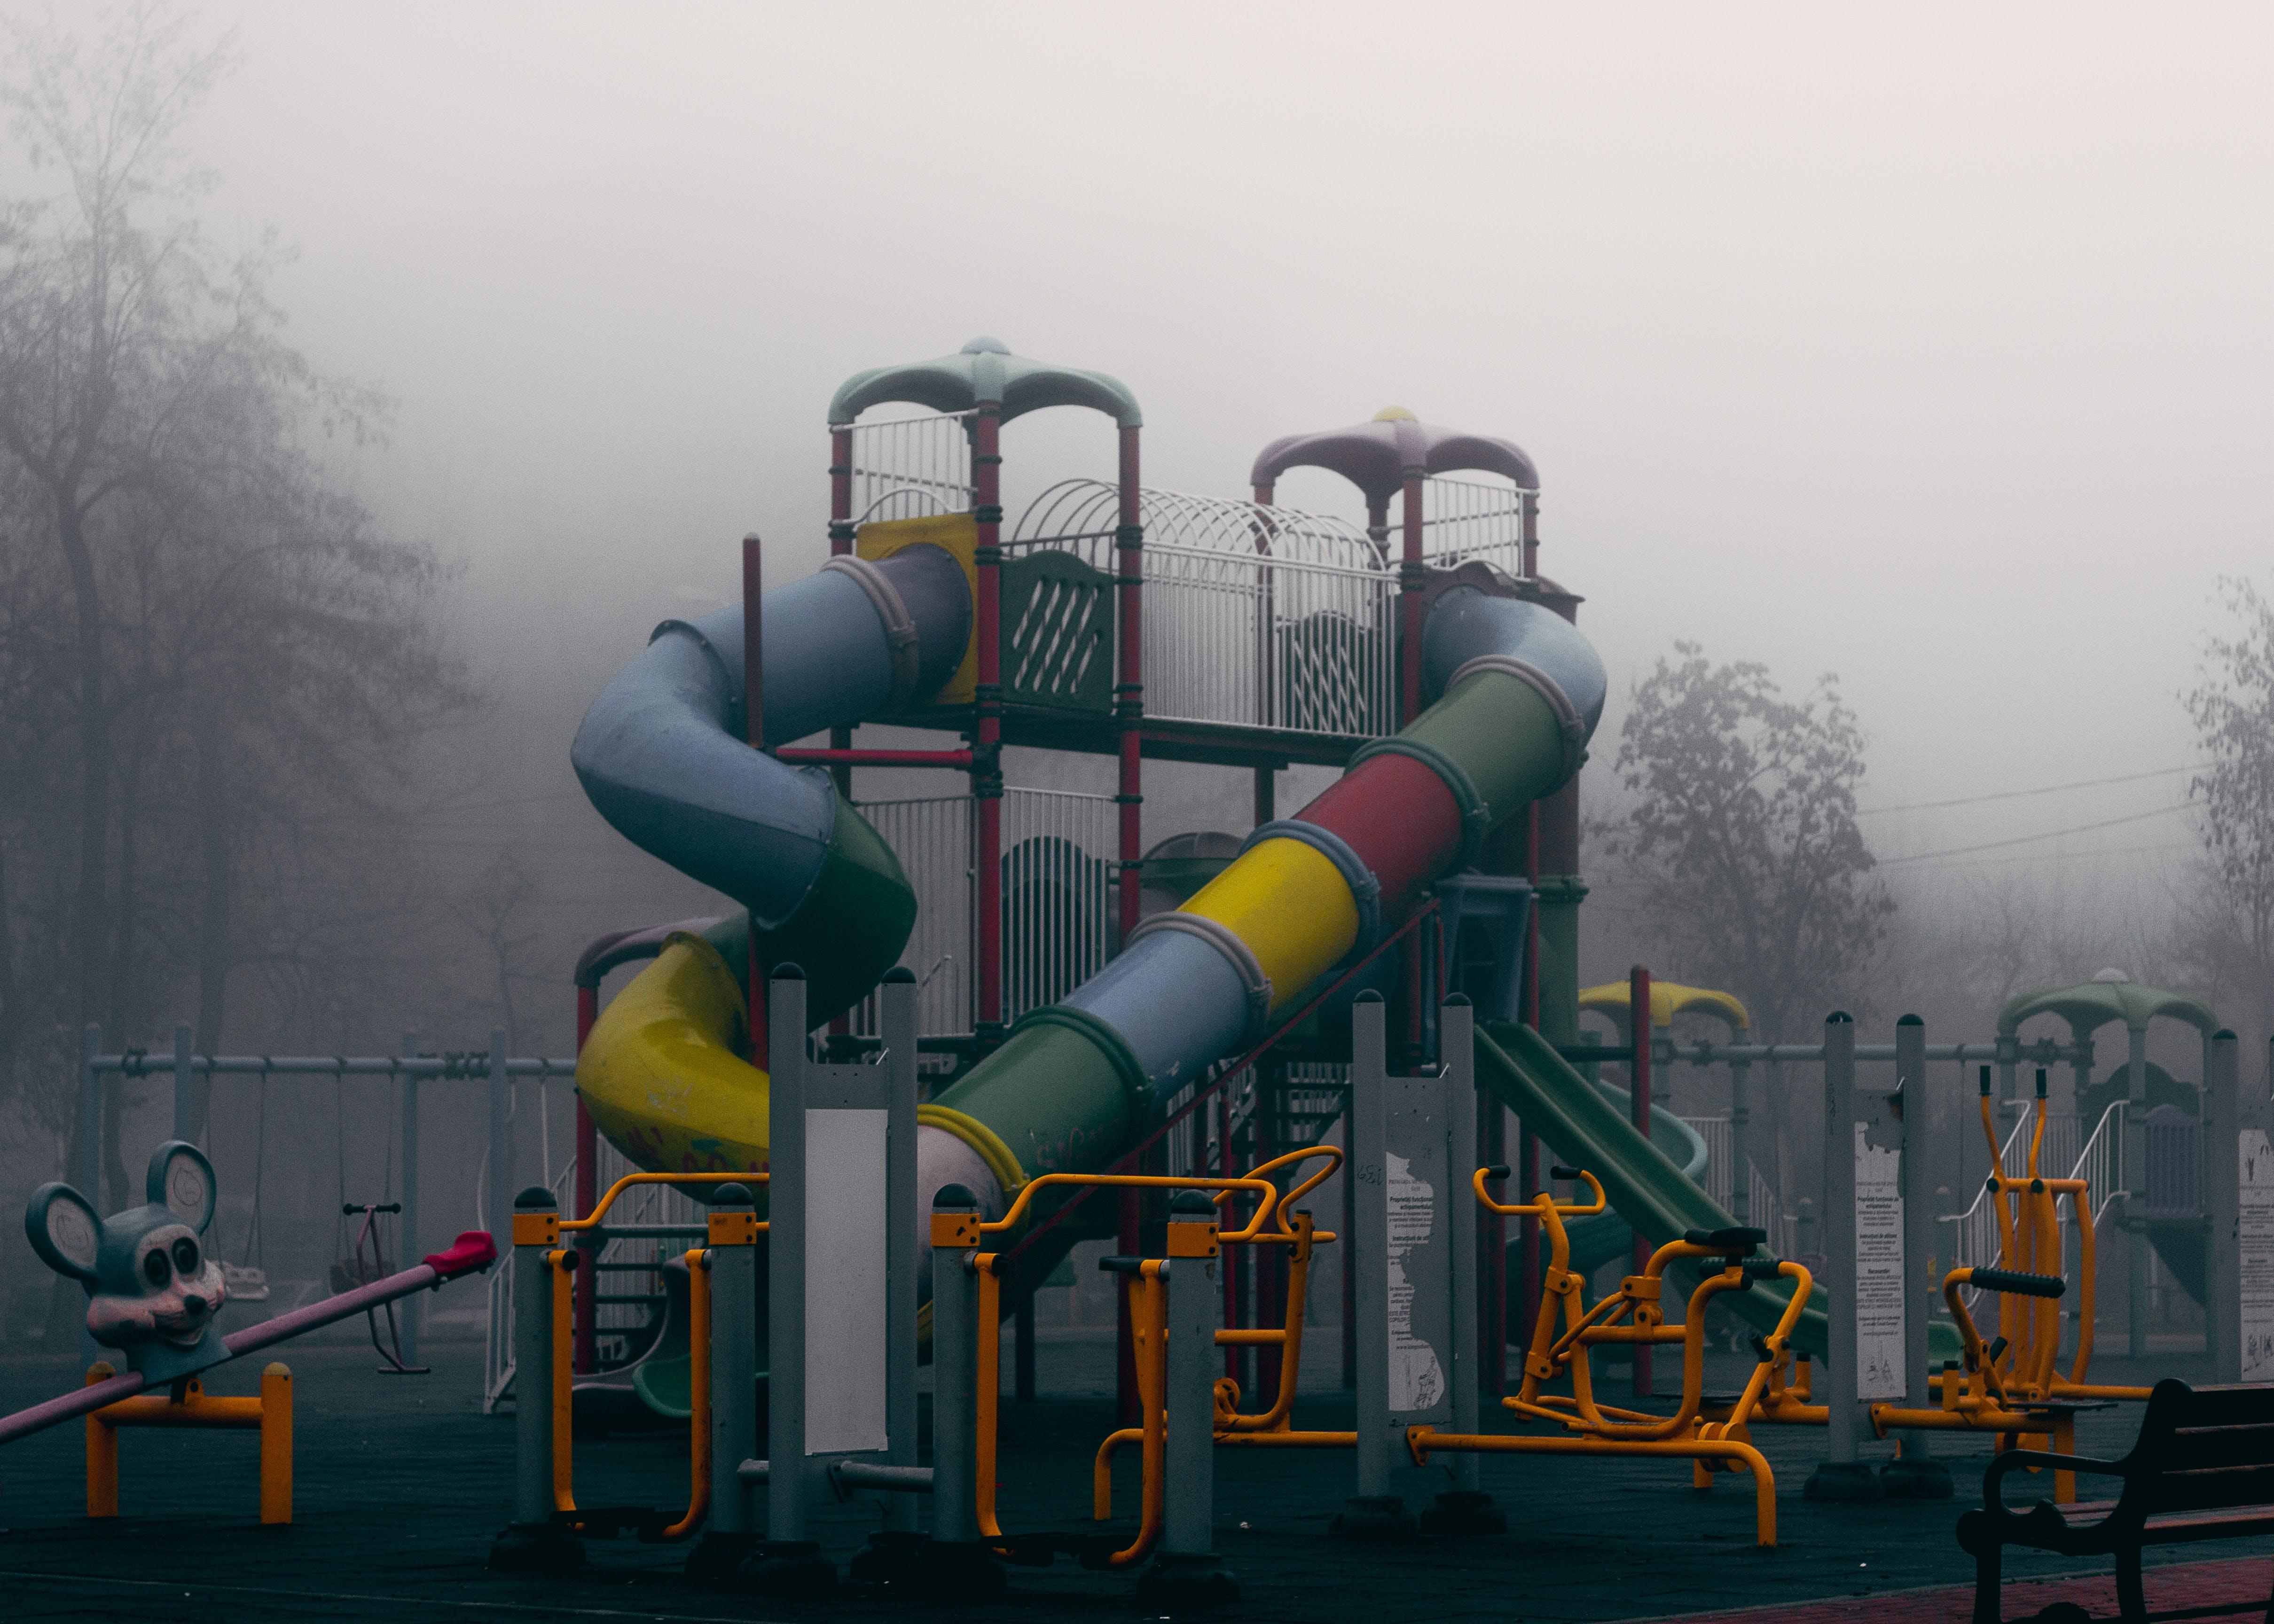 amusement park, fog, foggy